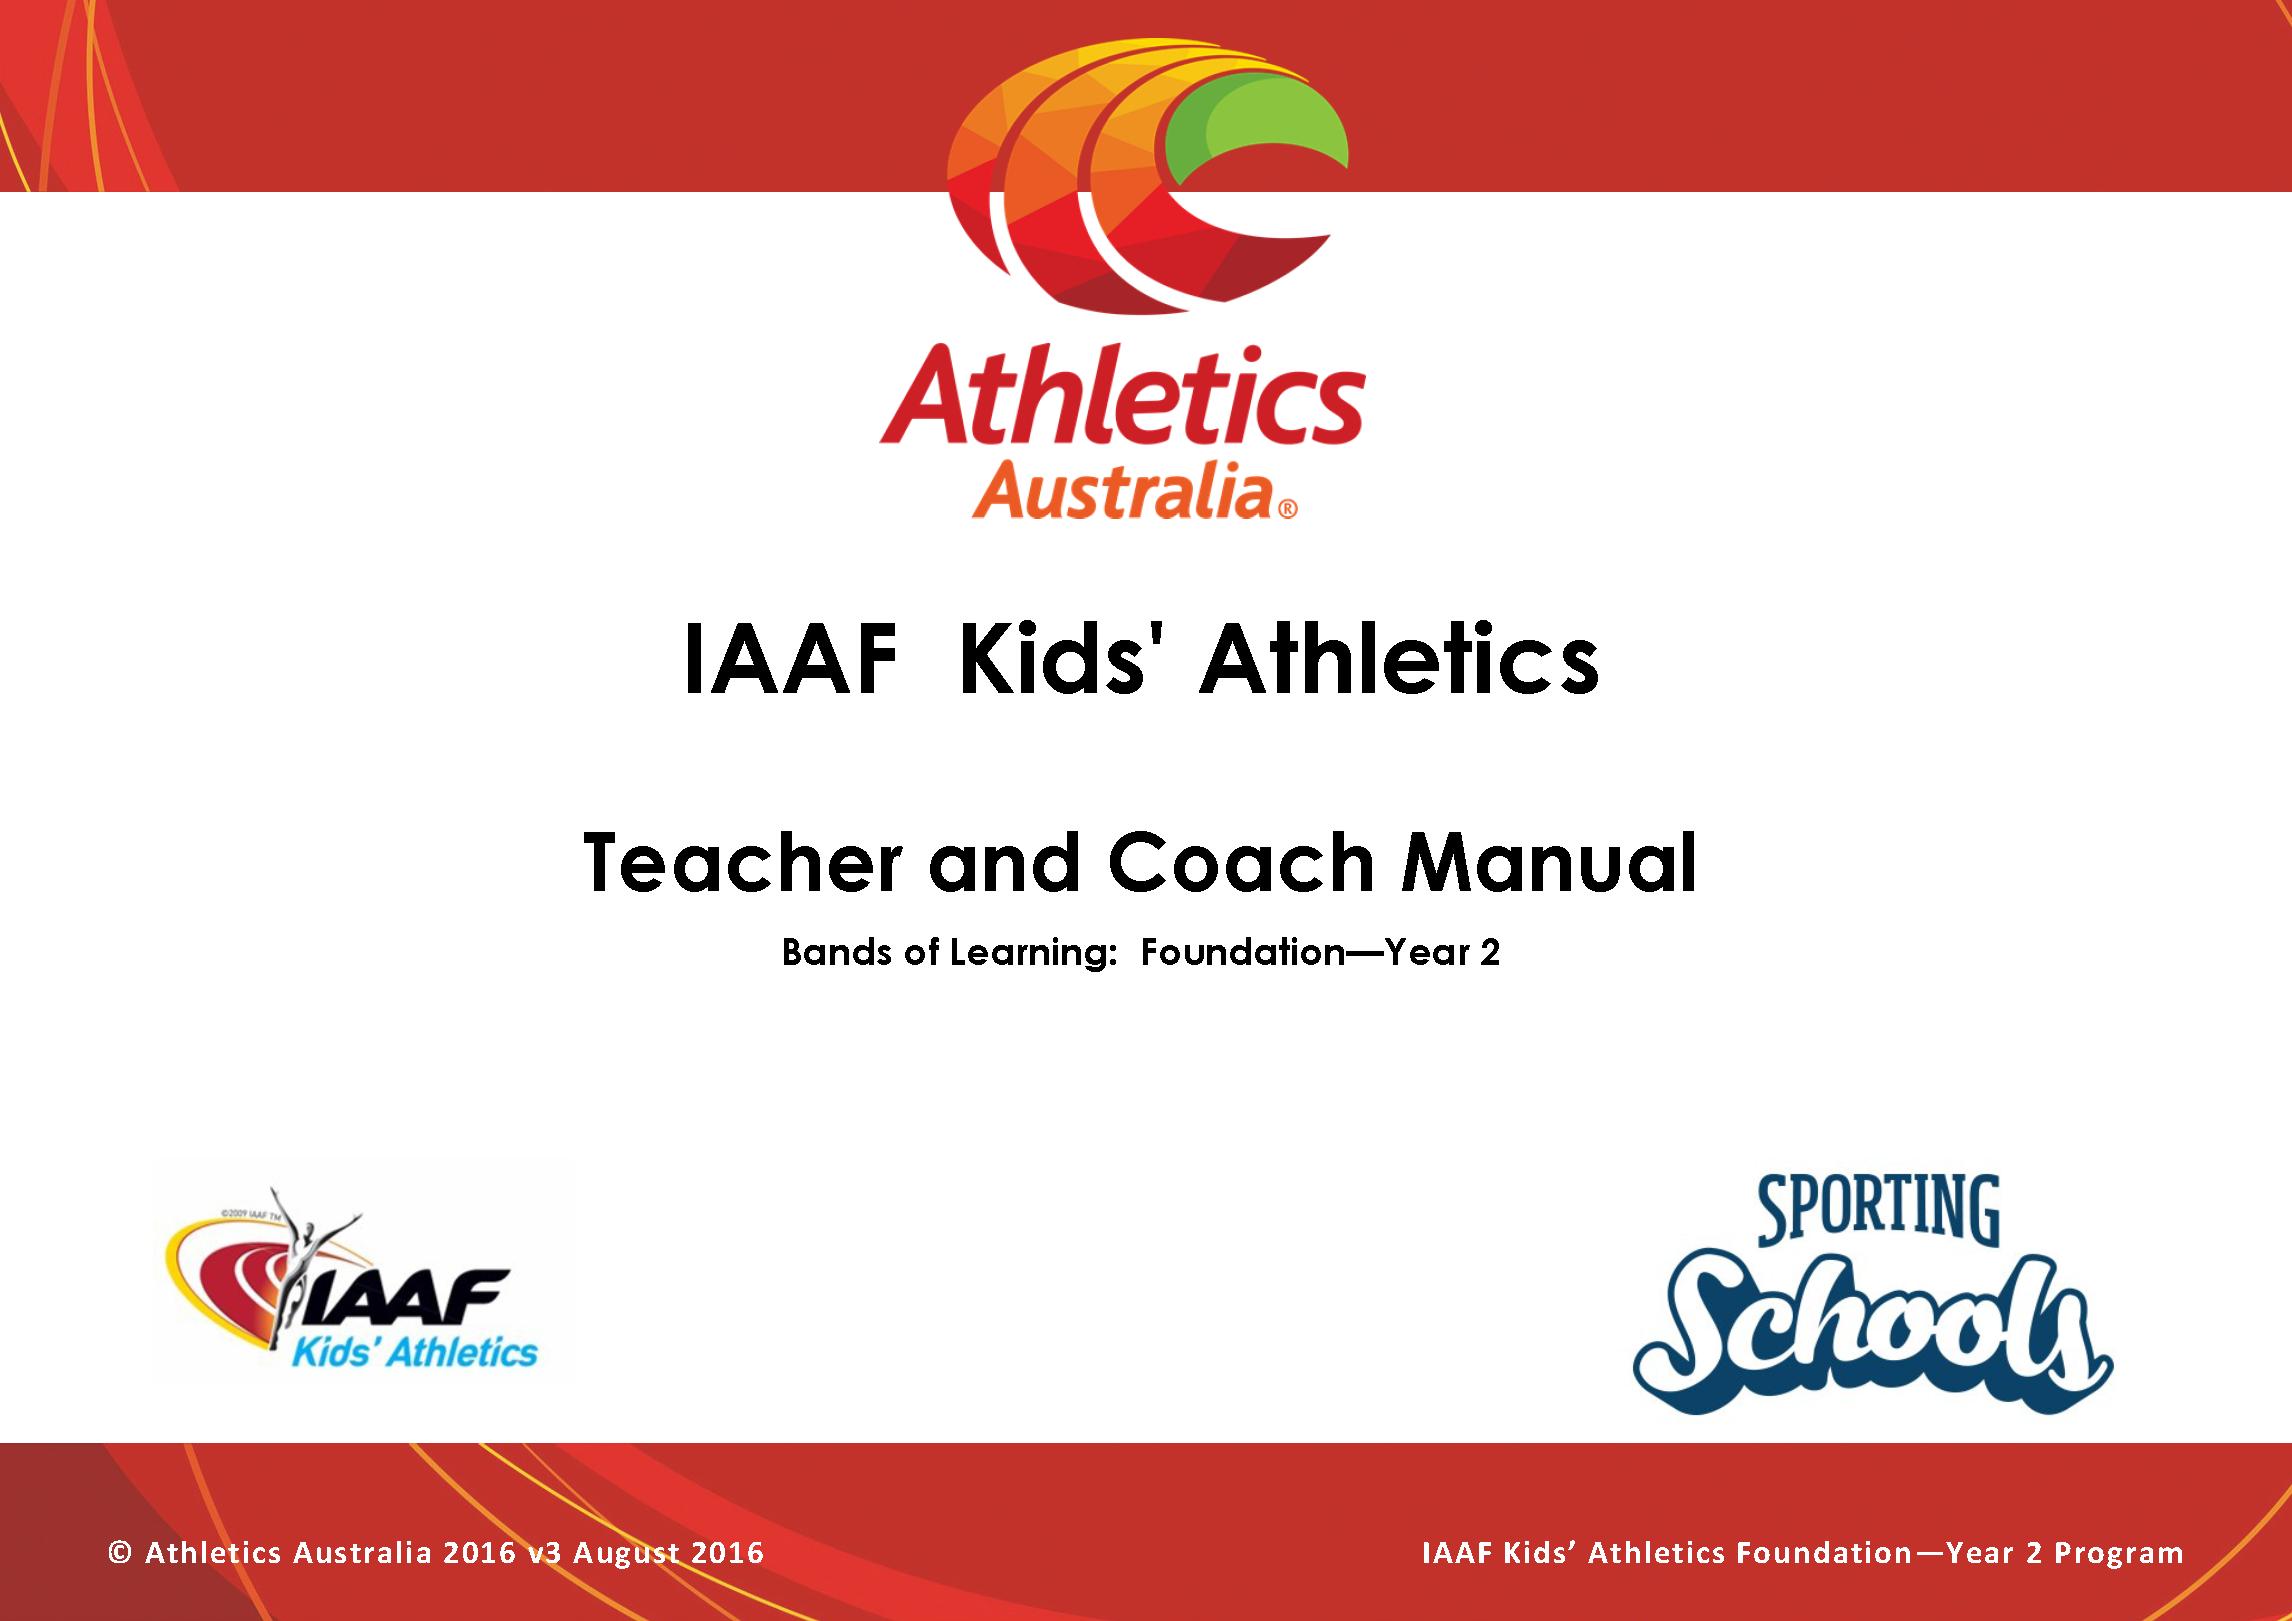 IAAF Kids Athletics Manual F-2 V4 February 2017_Page_01.png